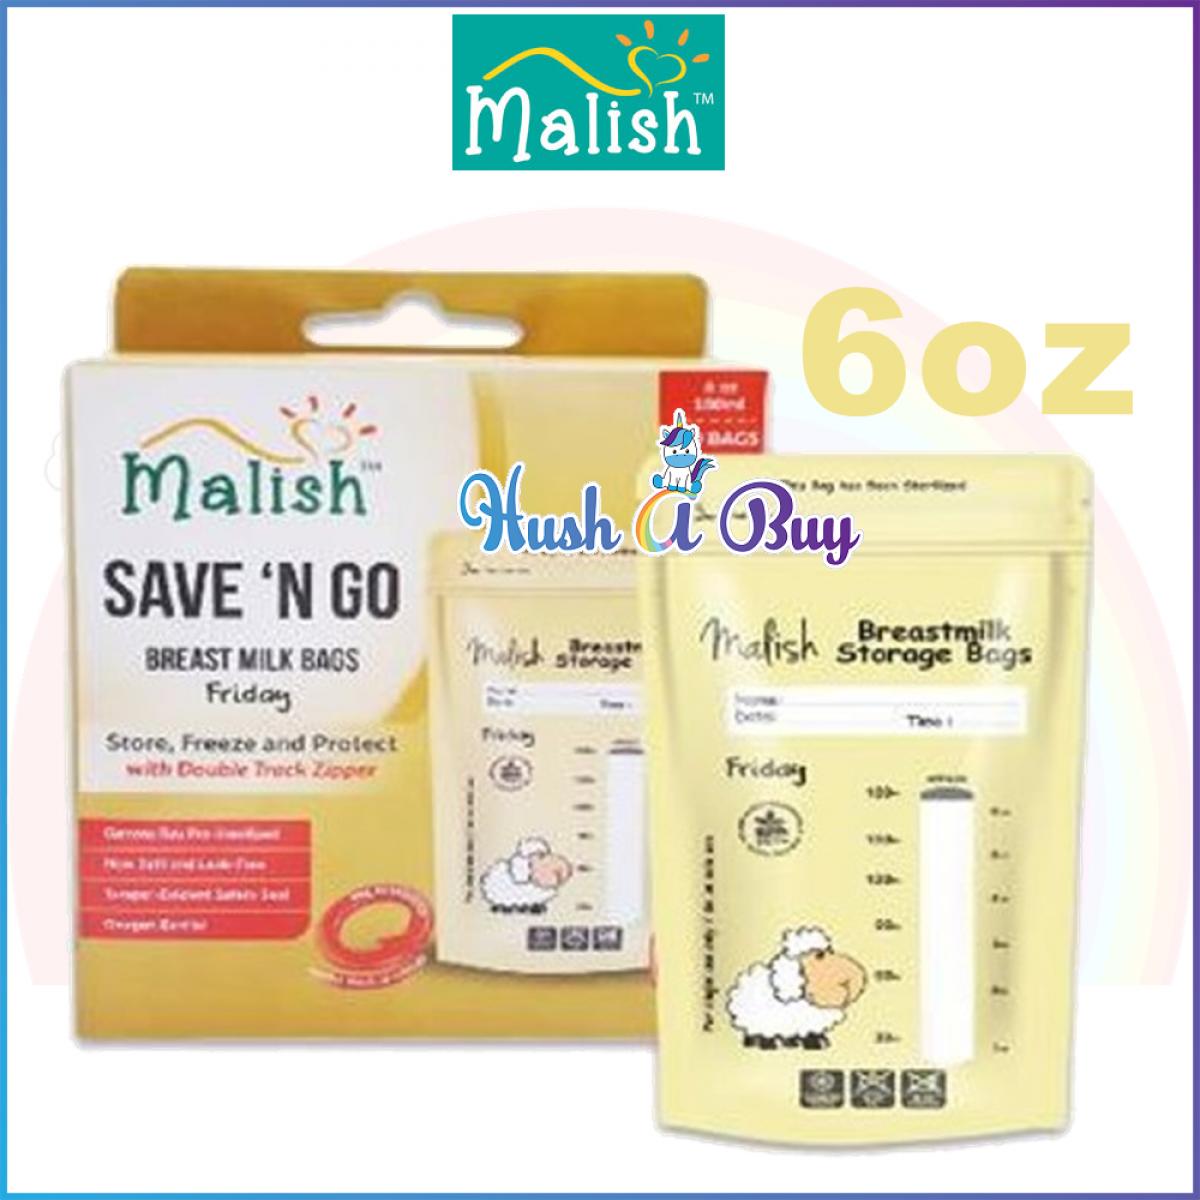 Malish - Save n Go Breast Milk Bags (25bags) 3.4oz/100ml 6oz/180ml